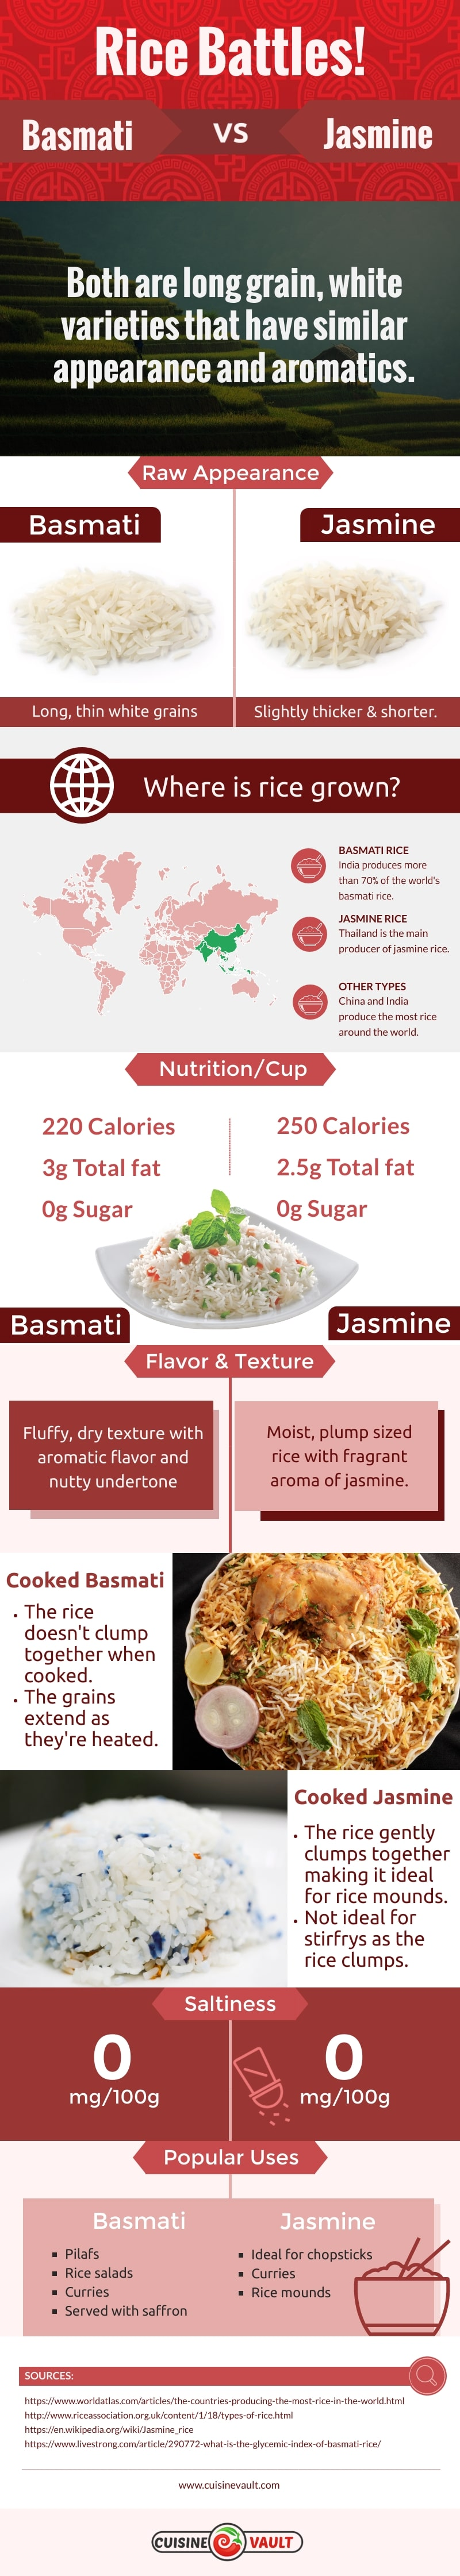 basmati rice vs jasmine rice